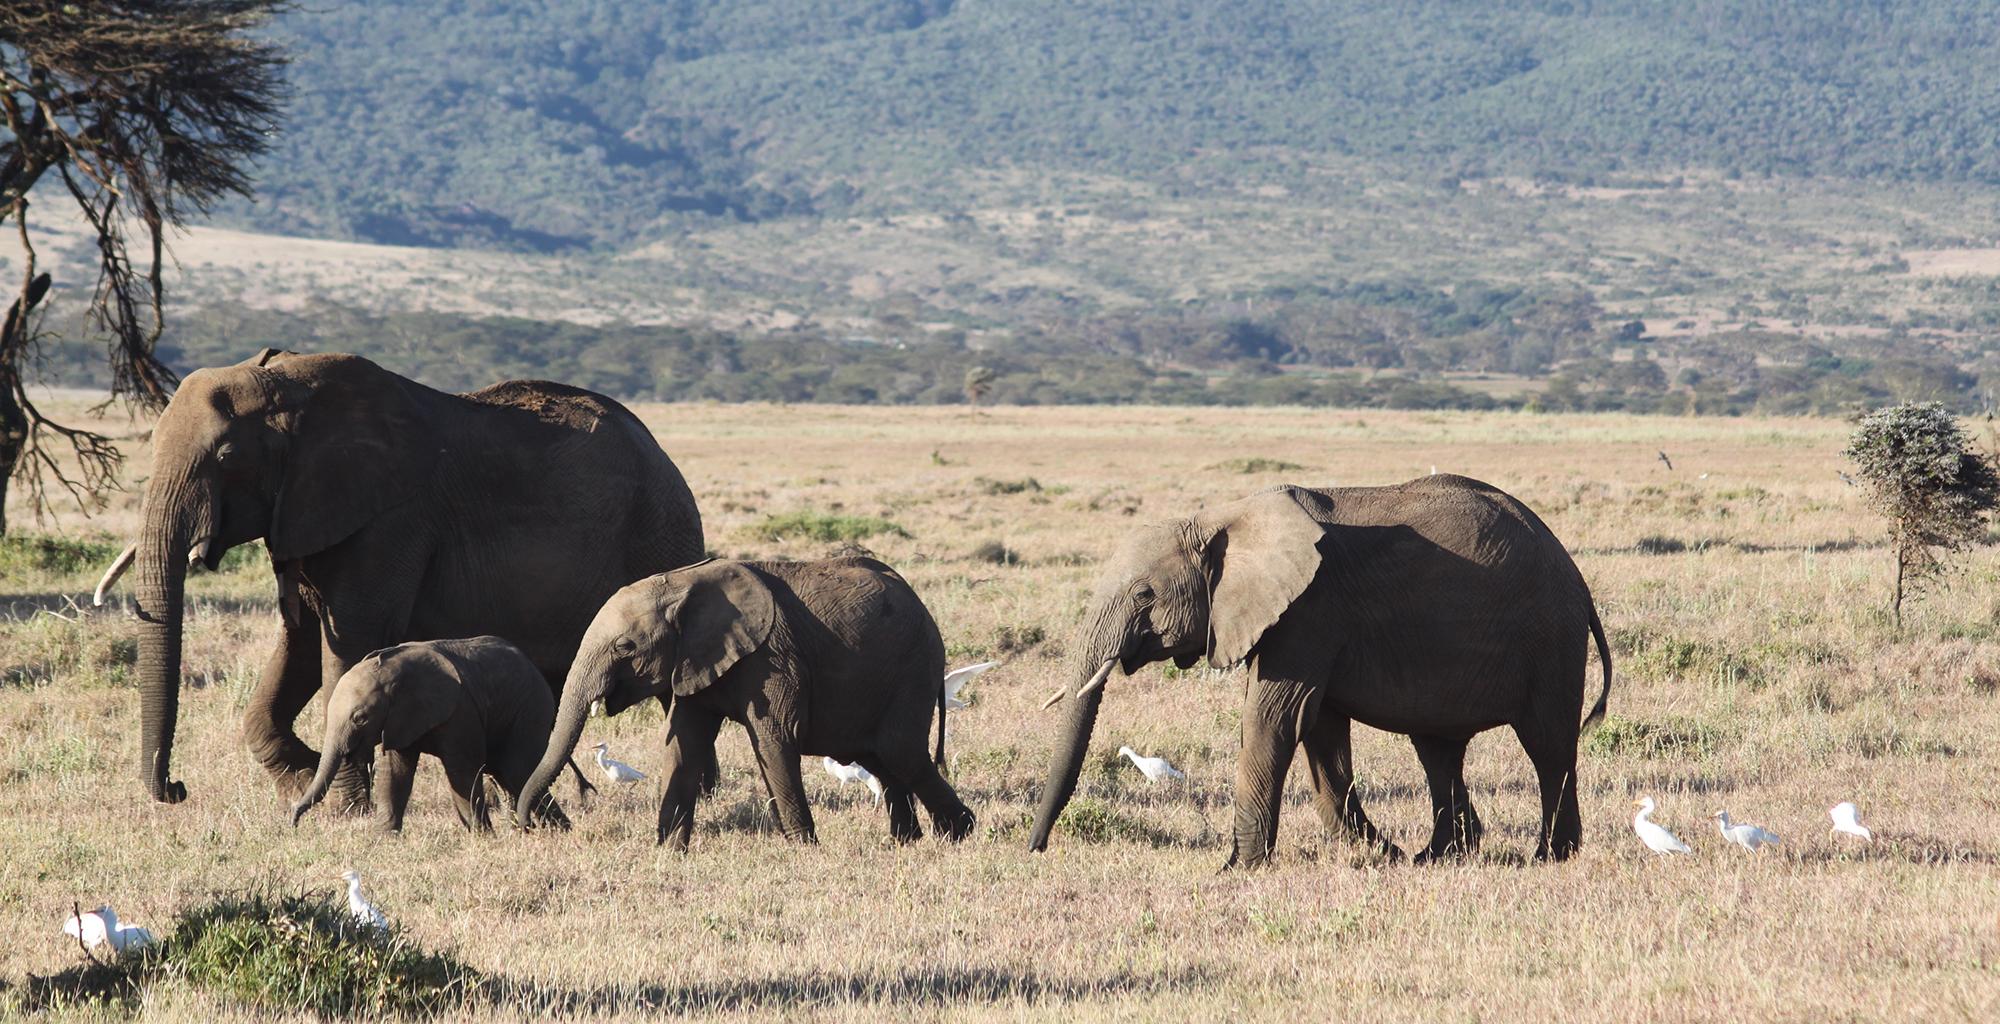 Kenya-Lewa-Safari-Camp-Elephants